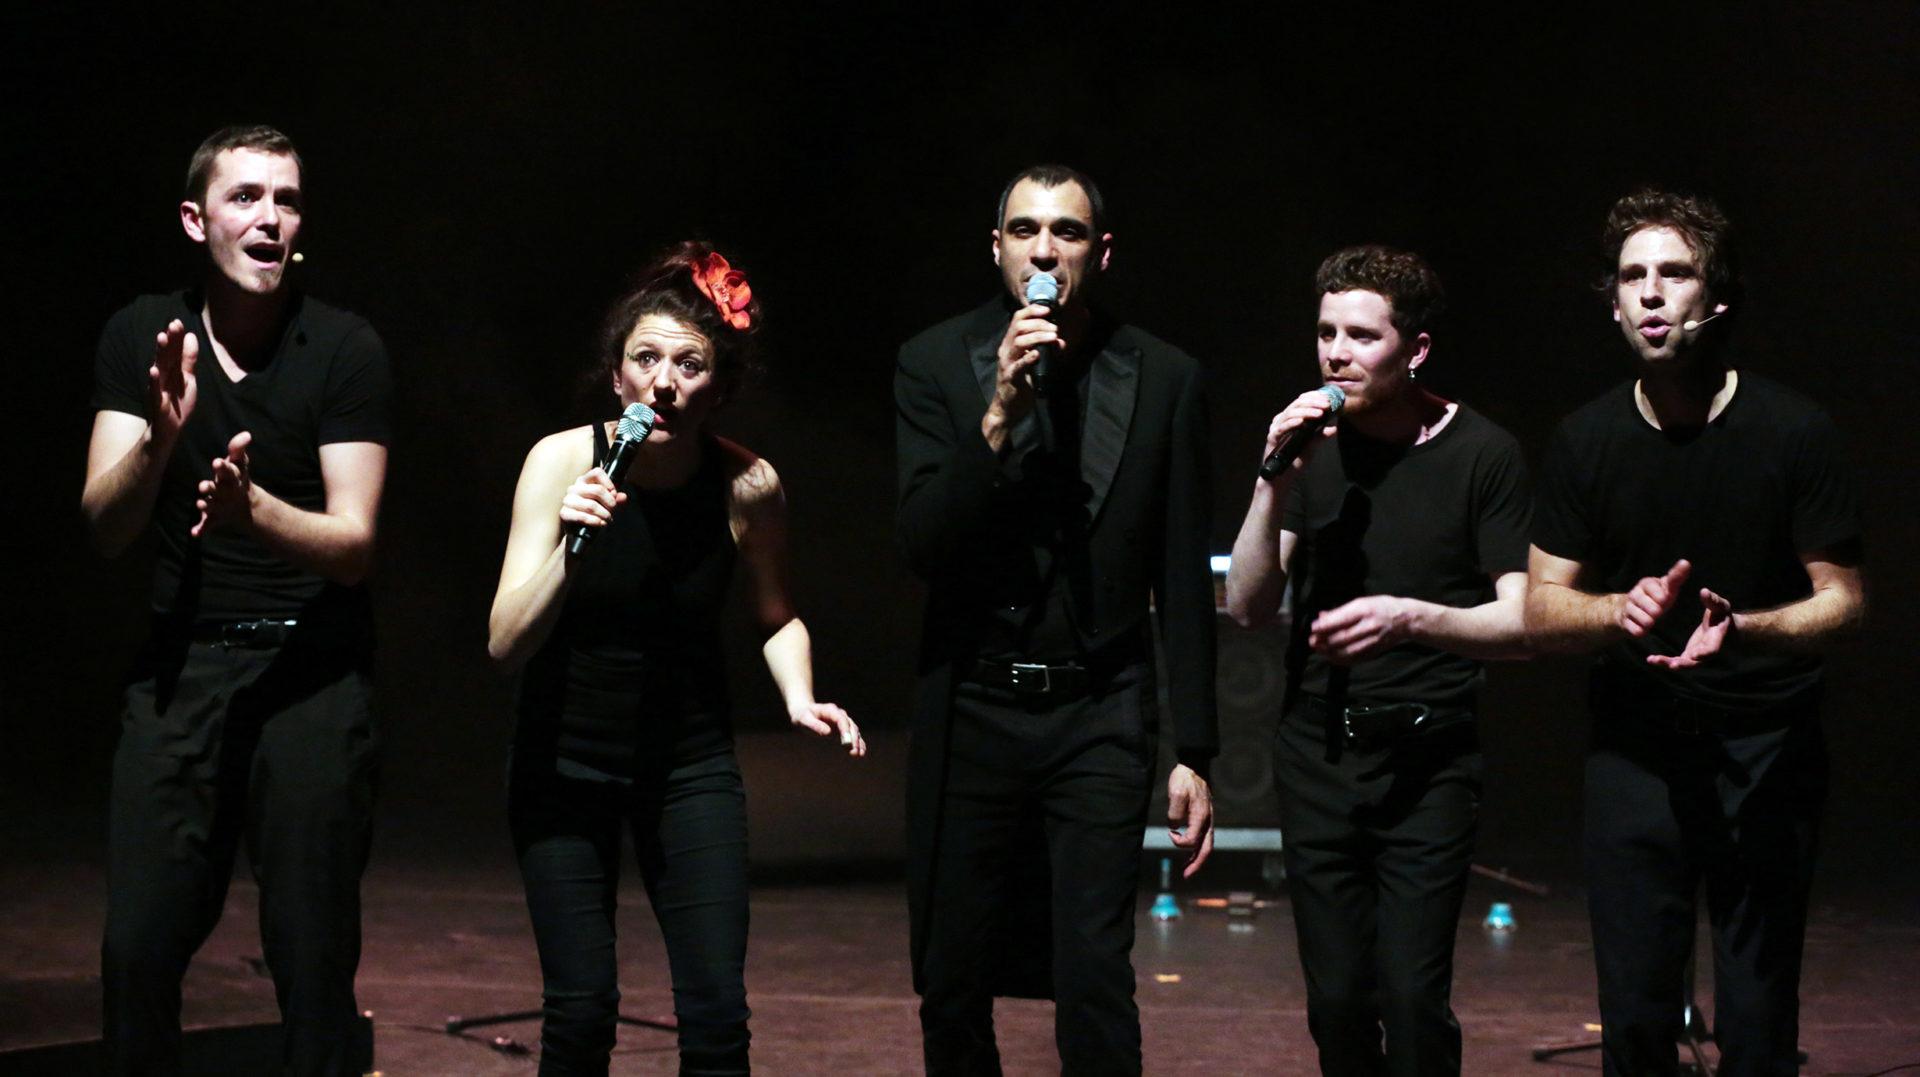 Taller amb Humanophones